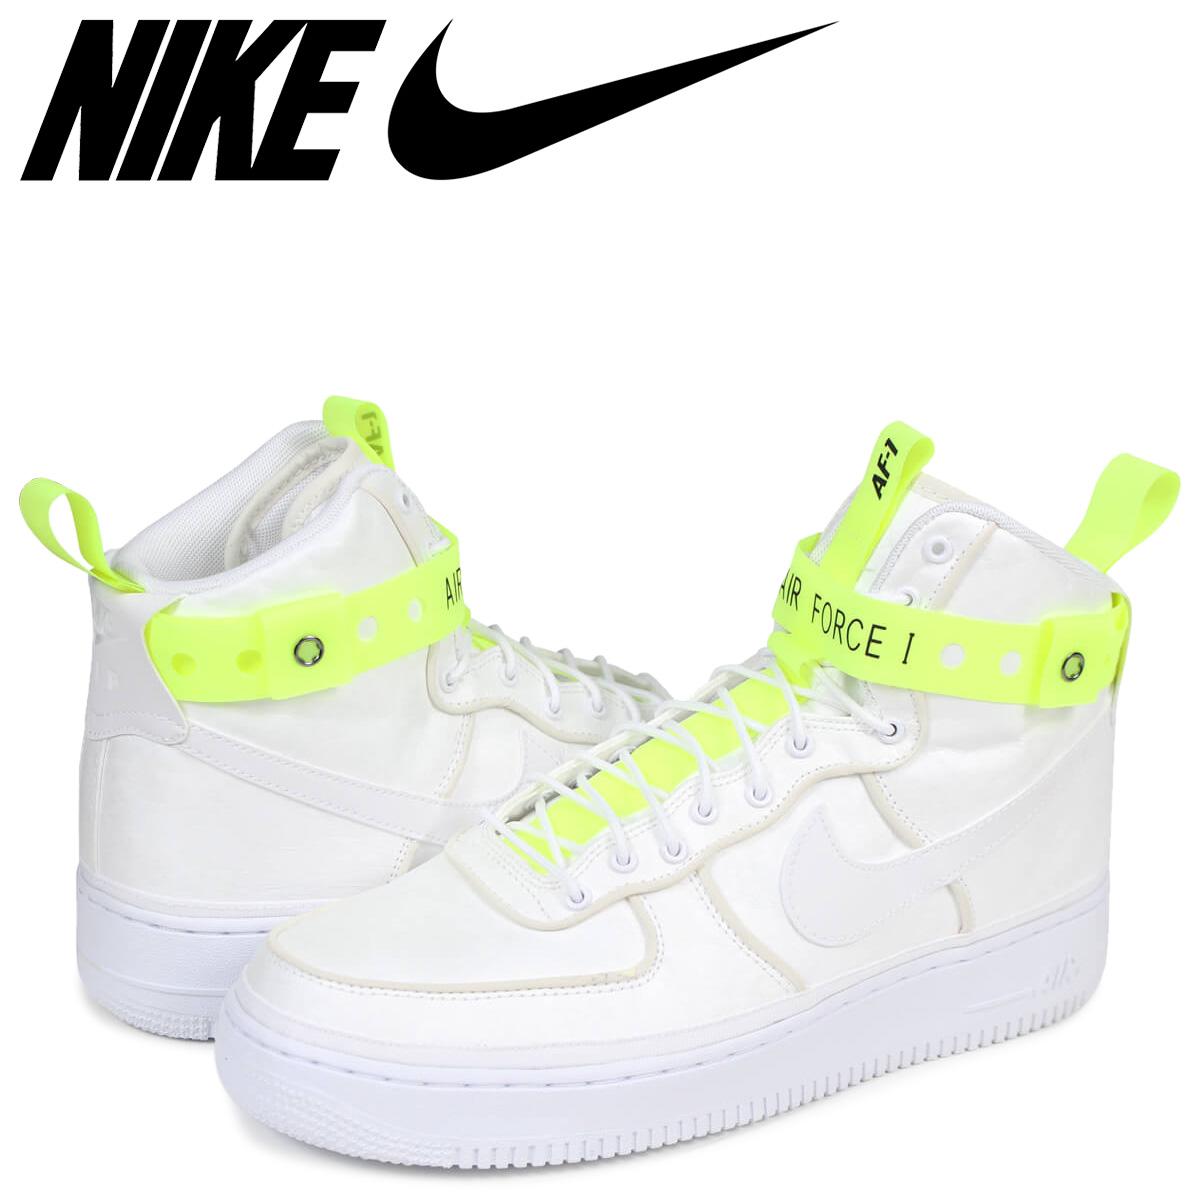 the best attitude 9aa48 567da NIKE AIR FORCE 1 HIGH VIP Nike air force 1 high sneakers men MAGIC STICK  collaboration white 573,967-101  183